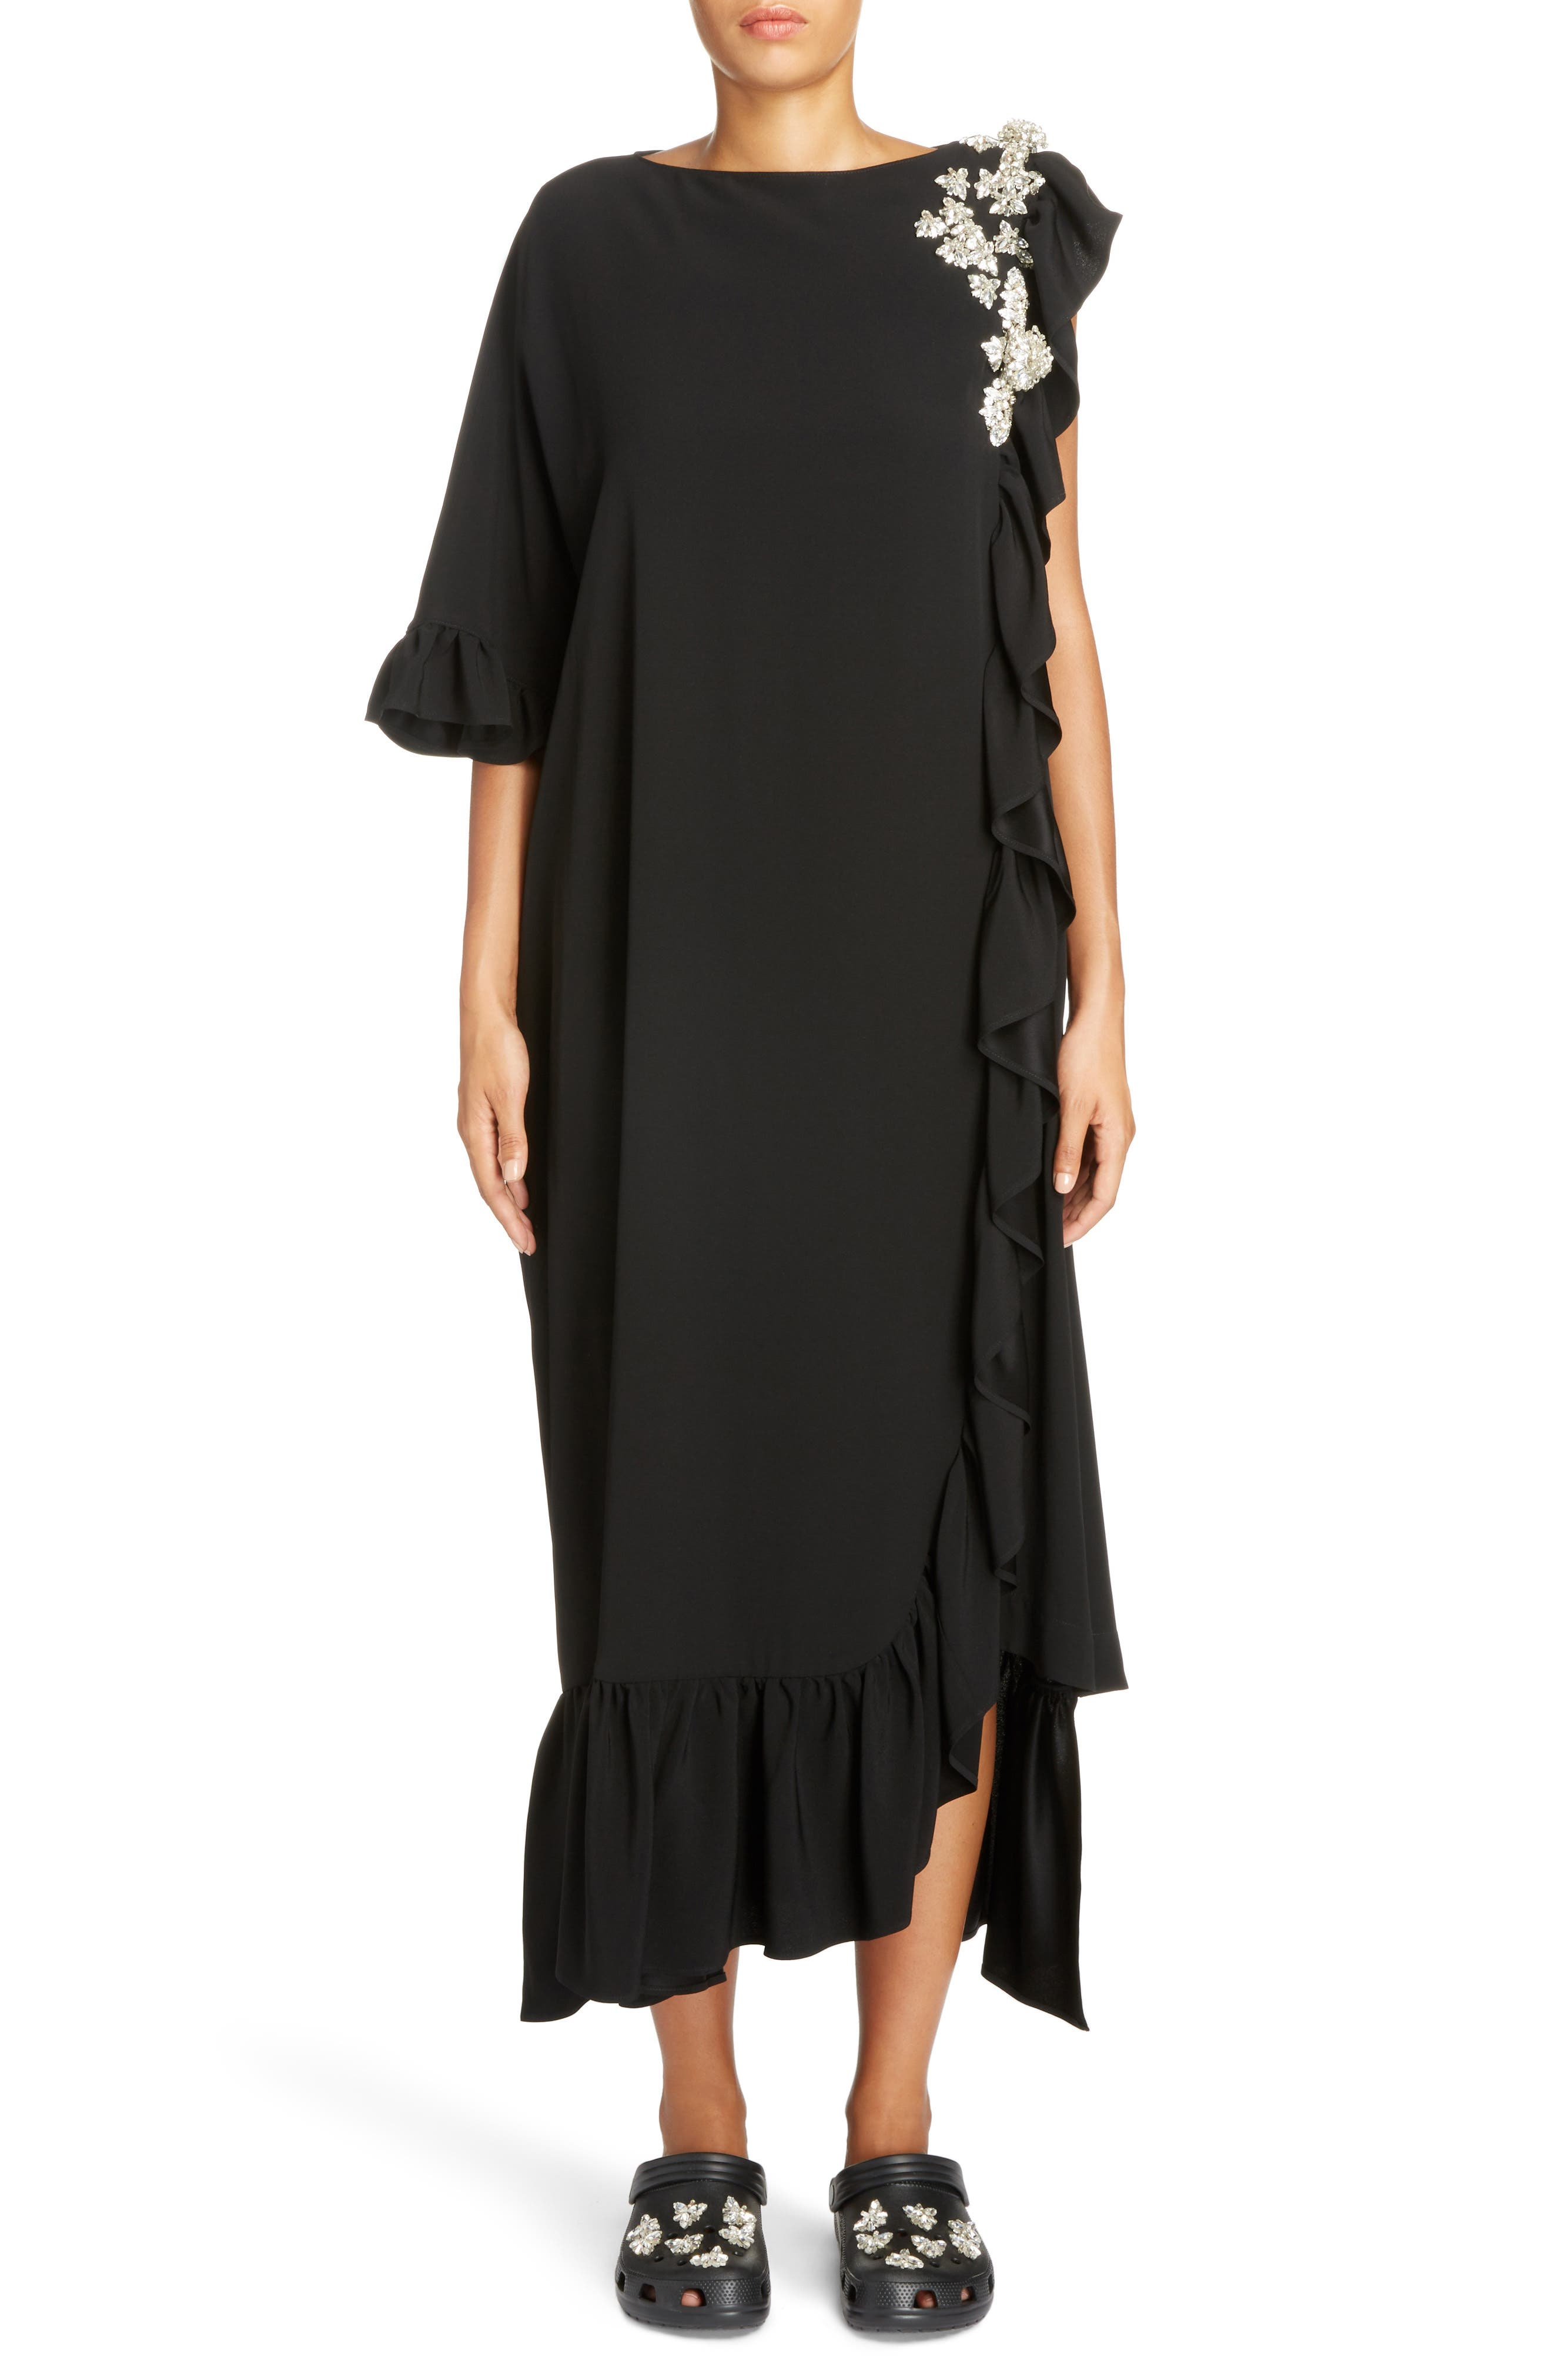 Main Image - Christopher Kane Crystal Embellished Frill Maxi Dress